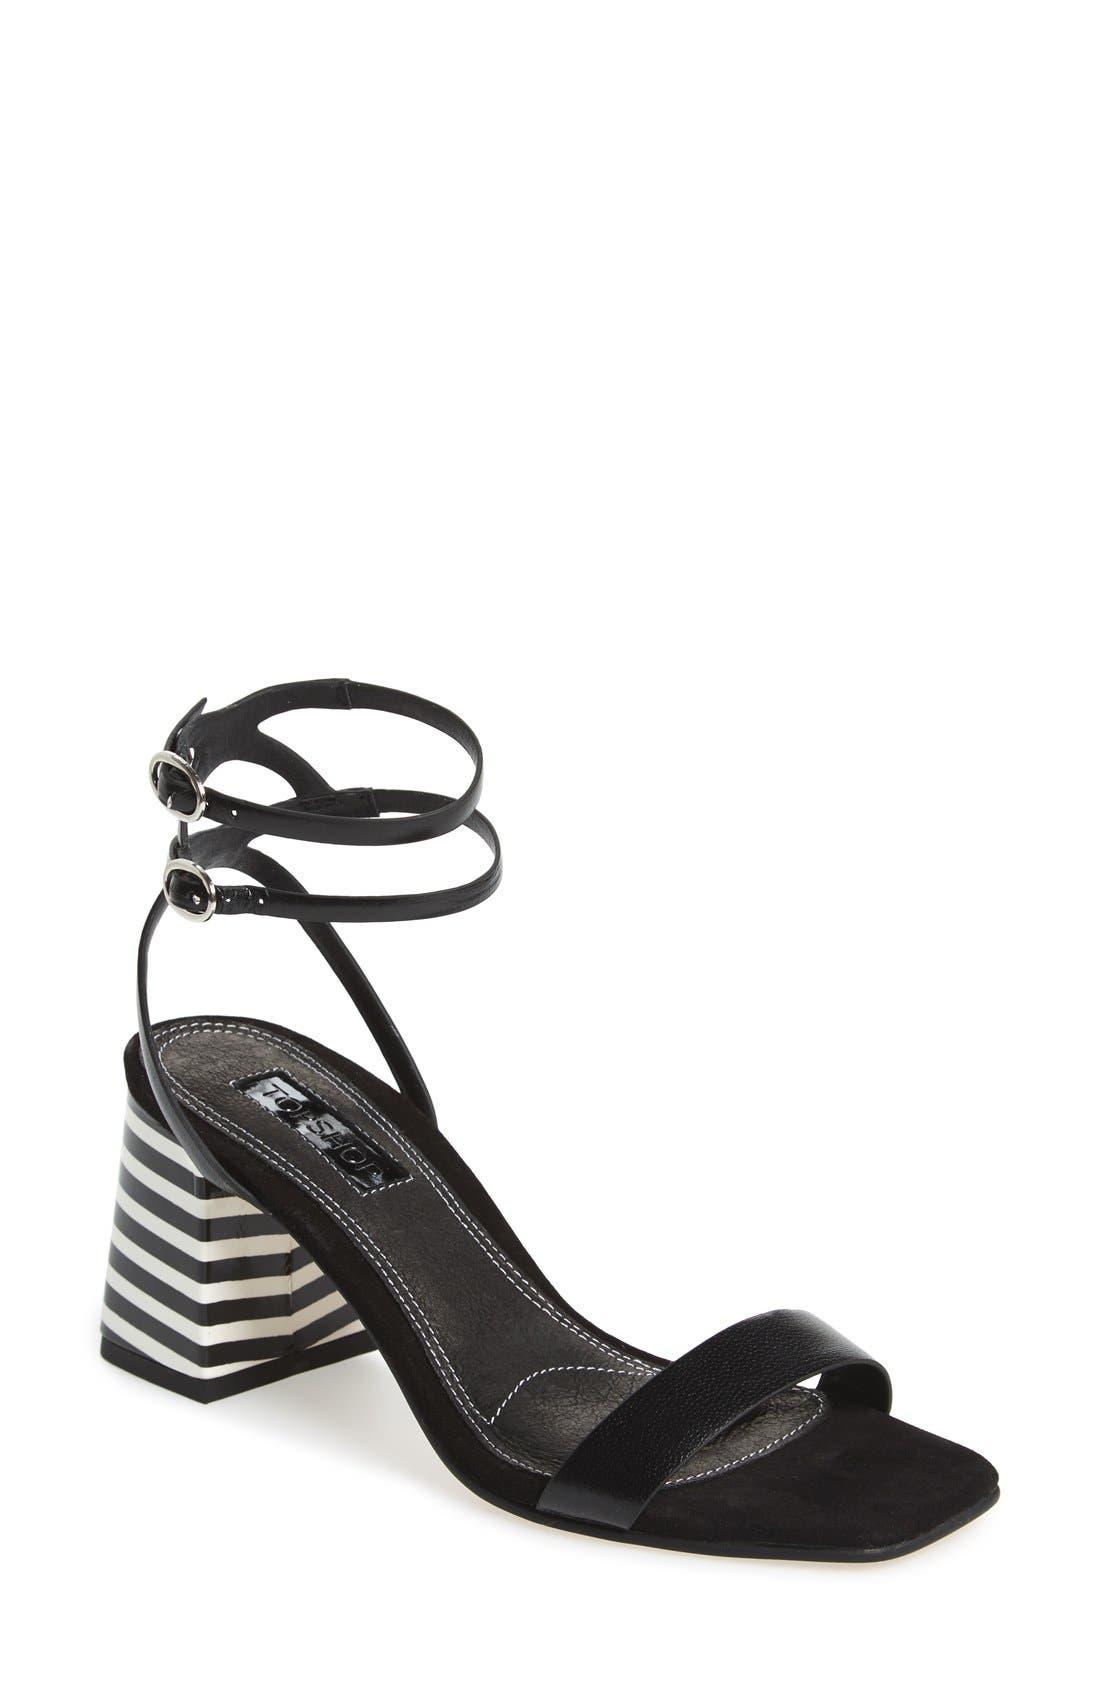 Alternate Image 1 Selected - Topshop 'Nipper' Ankle Wrap Sandal (Women)